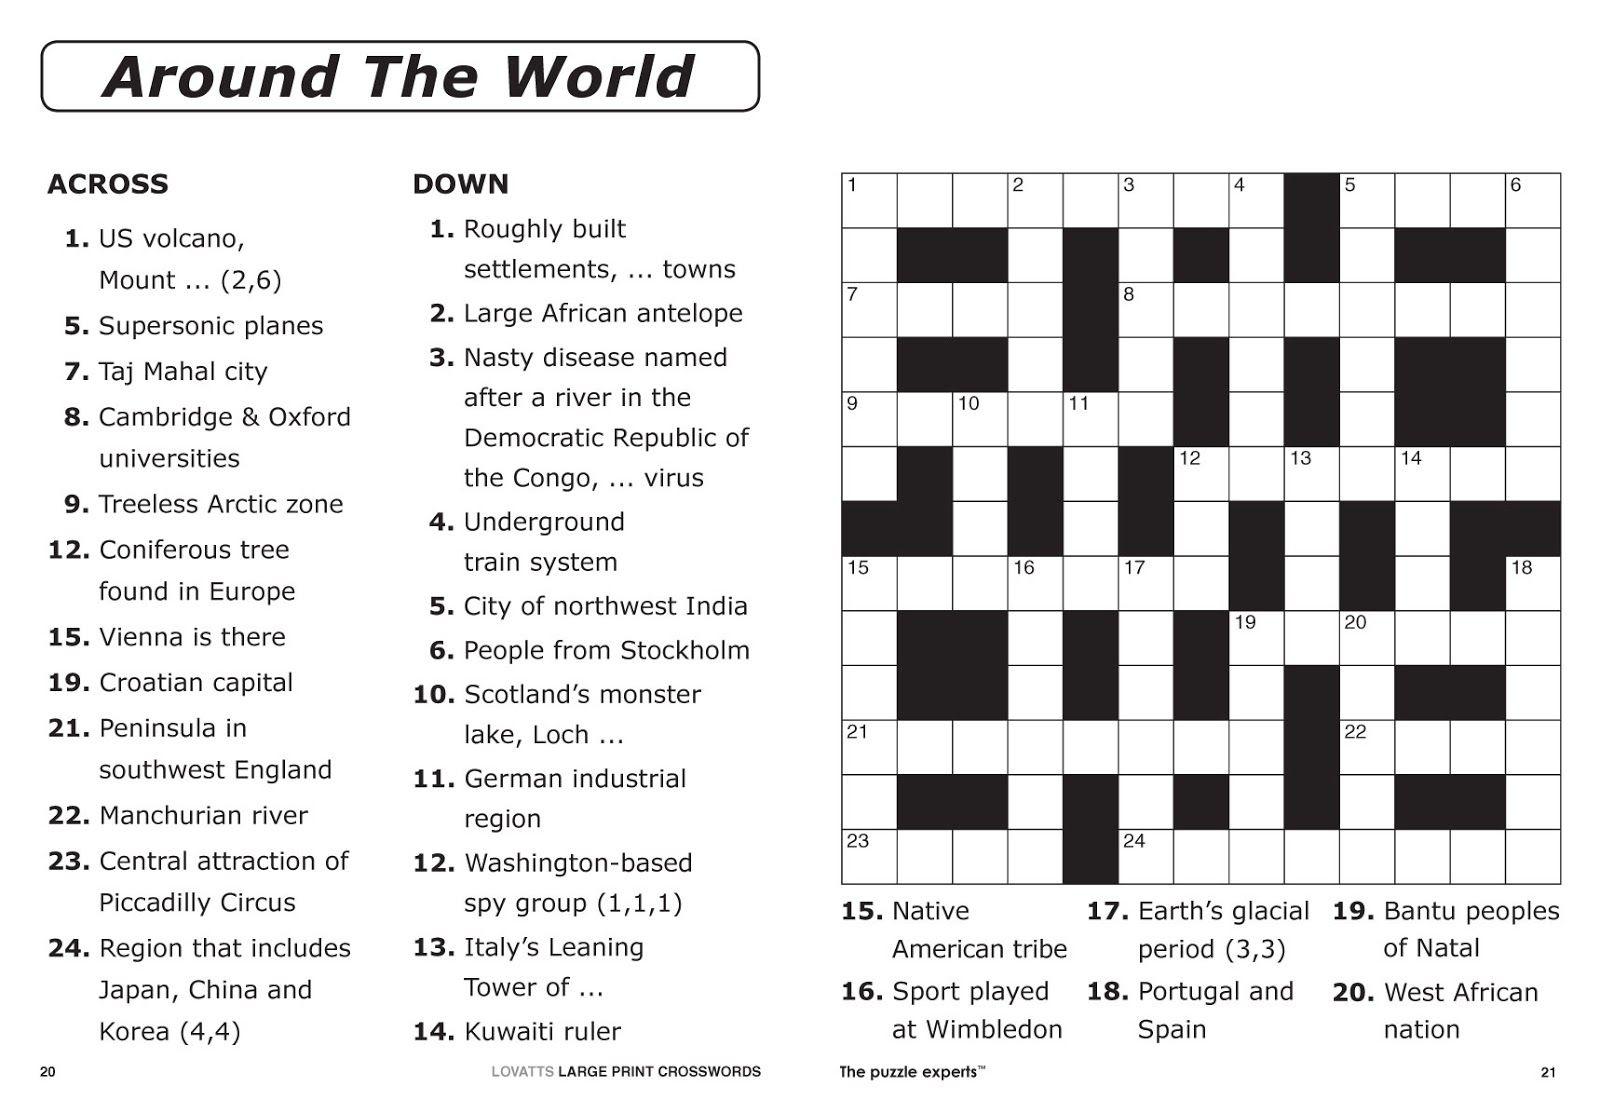 Free Printable Large Print Crossword Puzzles | M3U8 - You Magazine Printable Crossword Puzzles